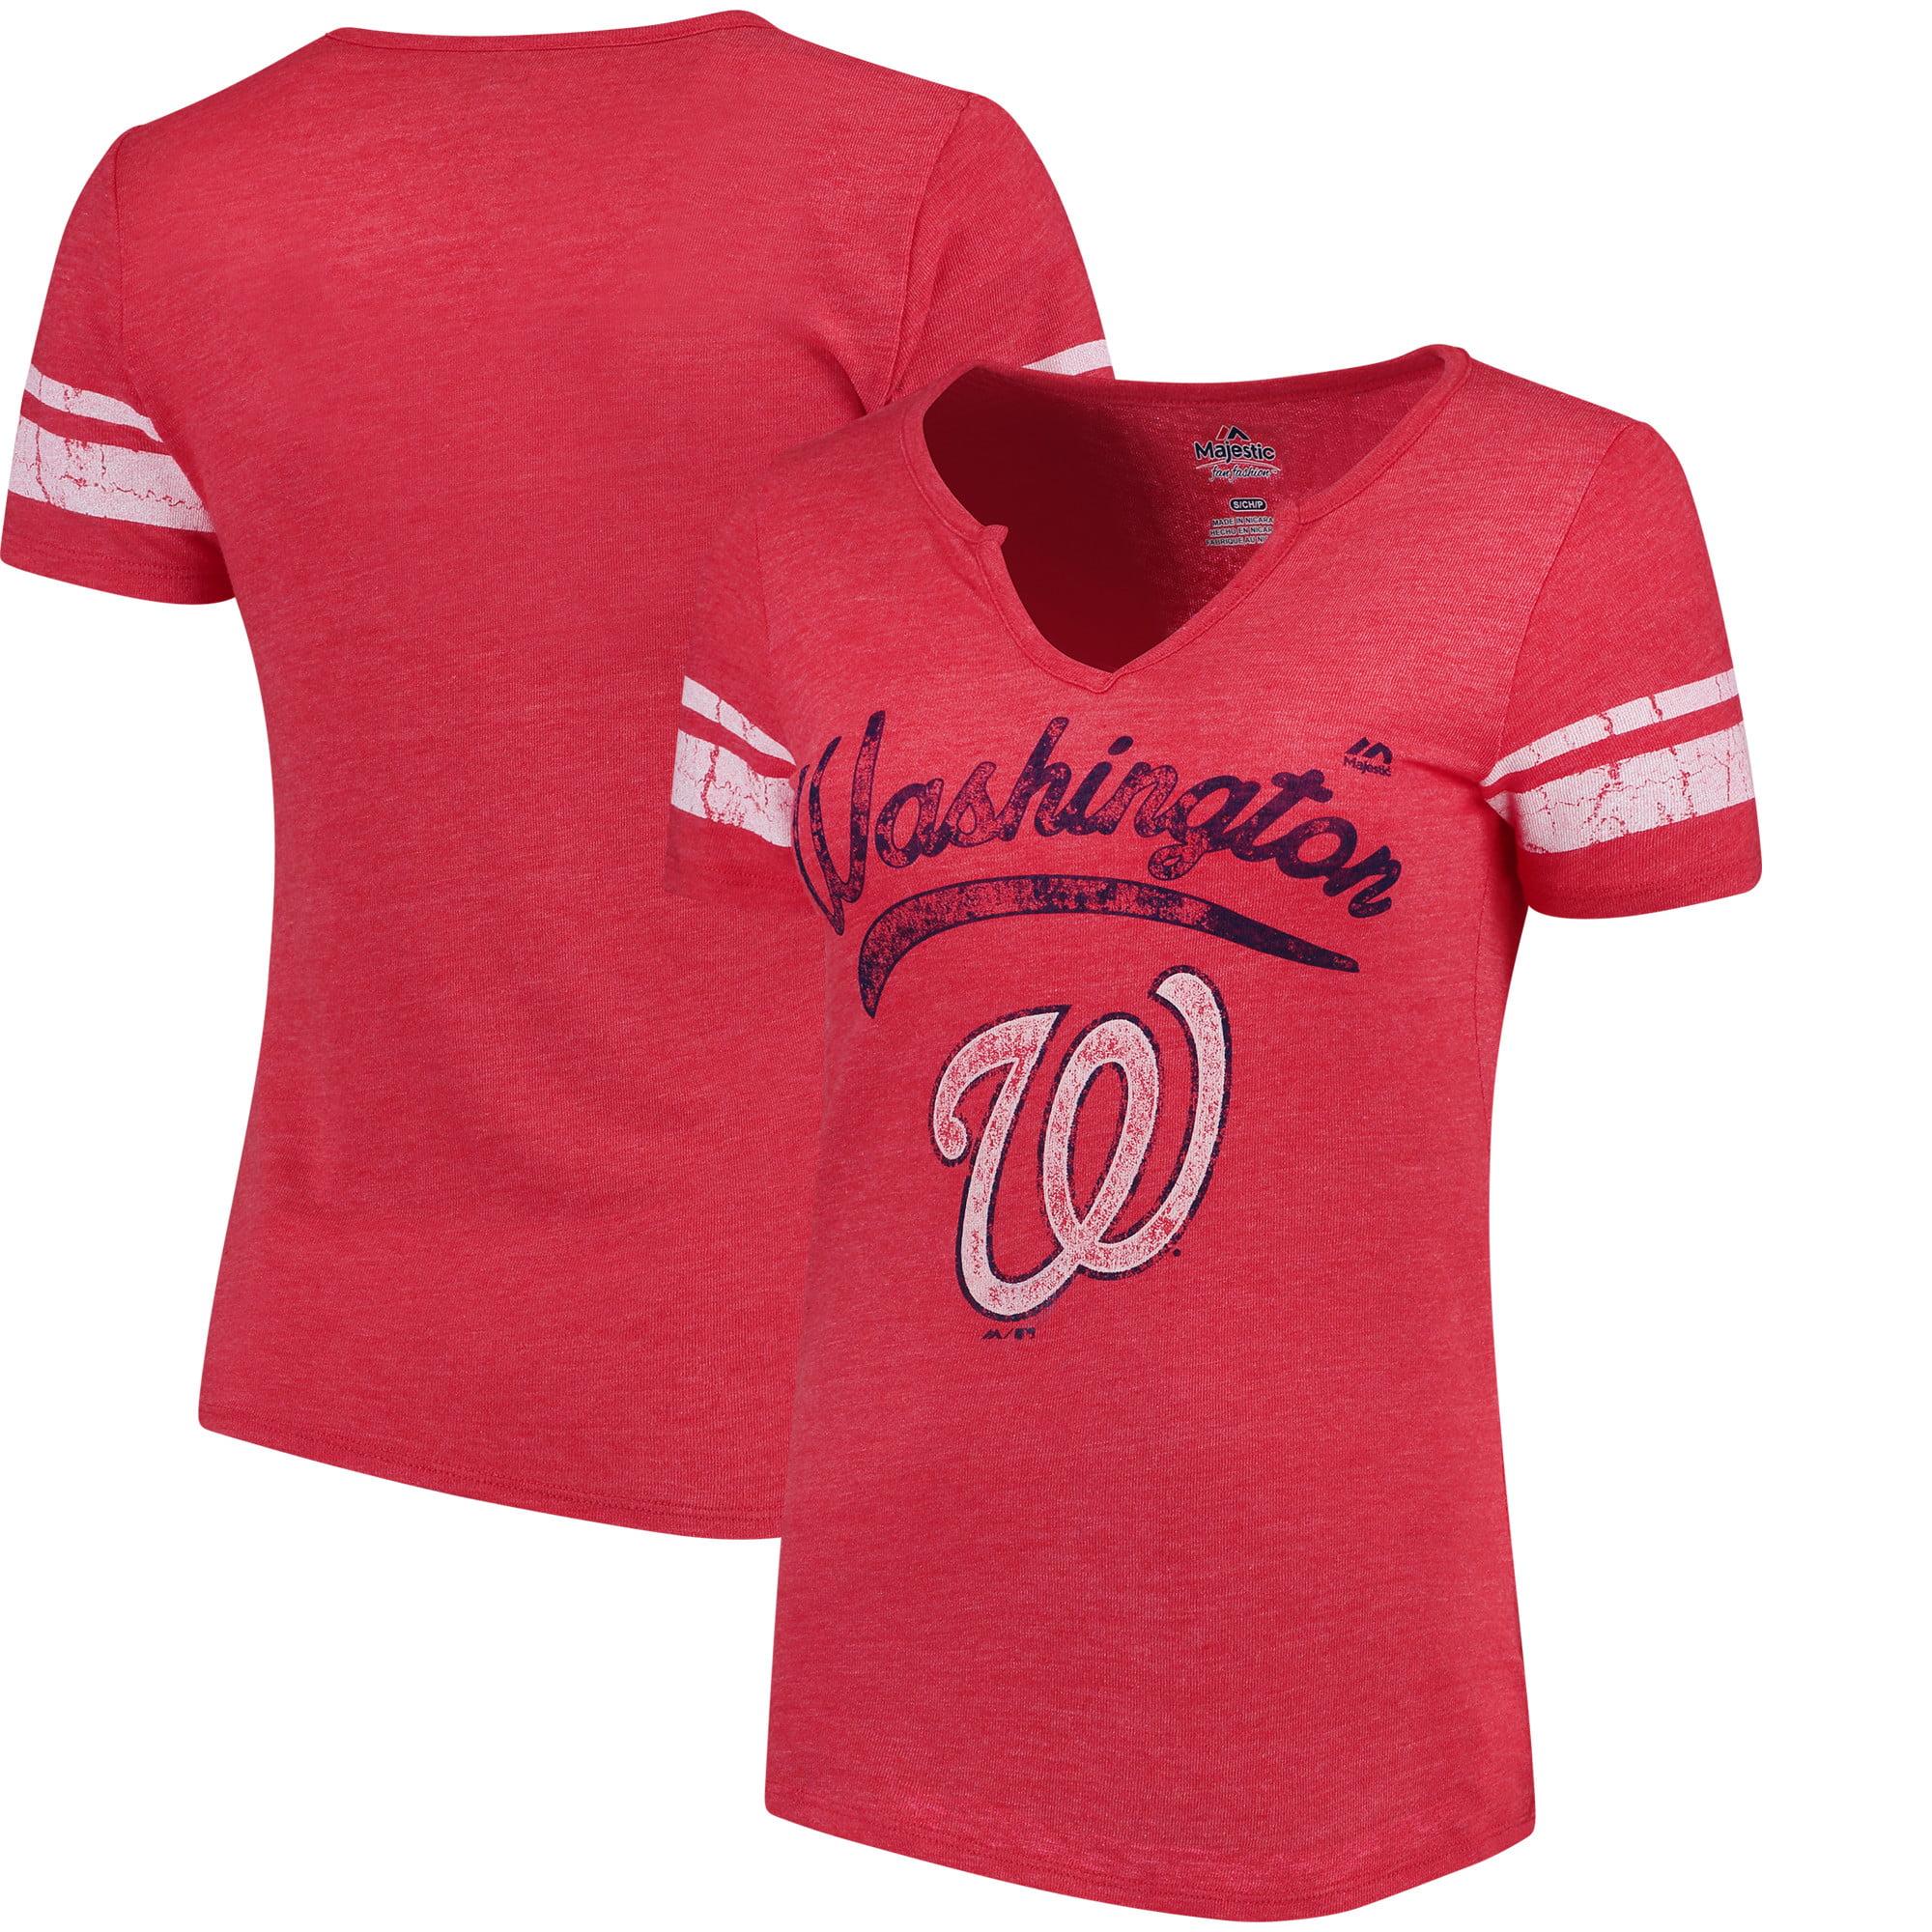 Washington Nationals Majestic Women's Spirit Awareness V-Neck T-Shirt - Heather Red